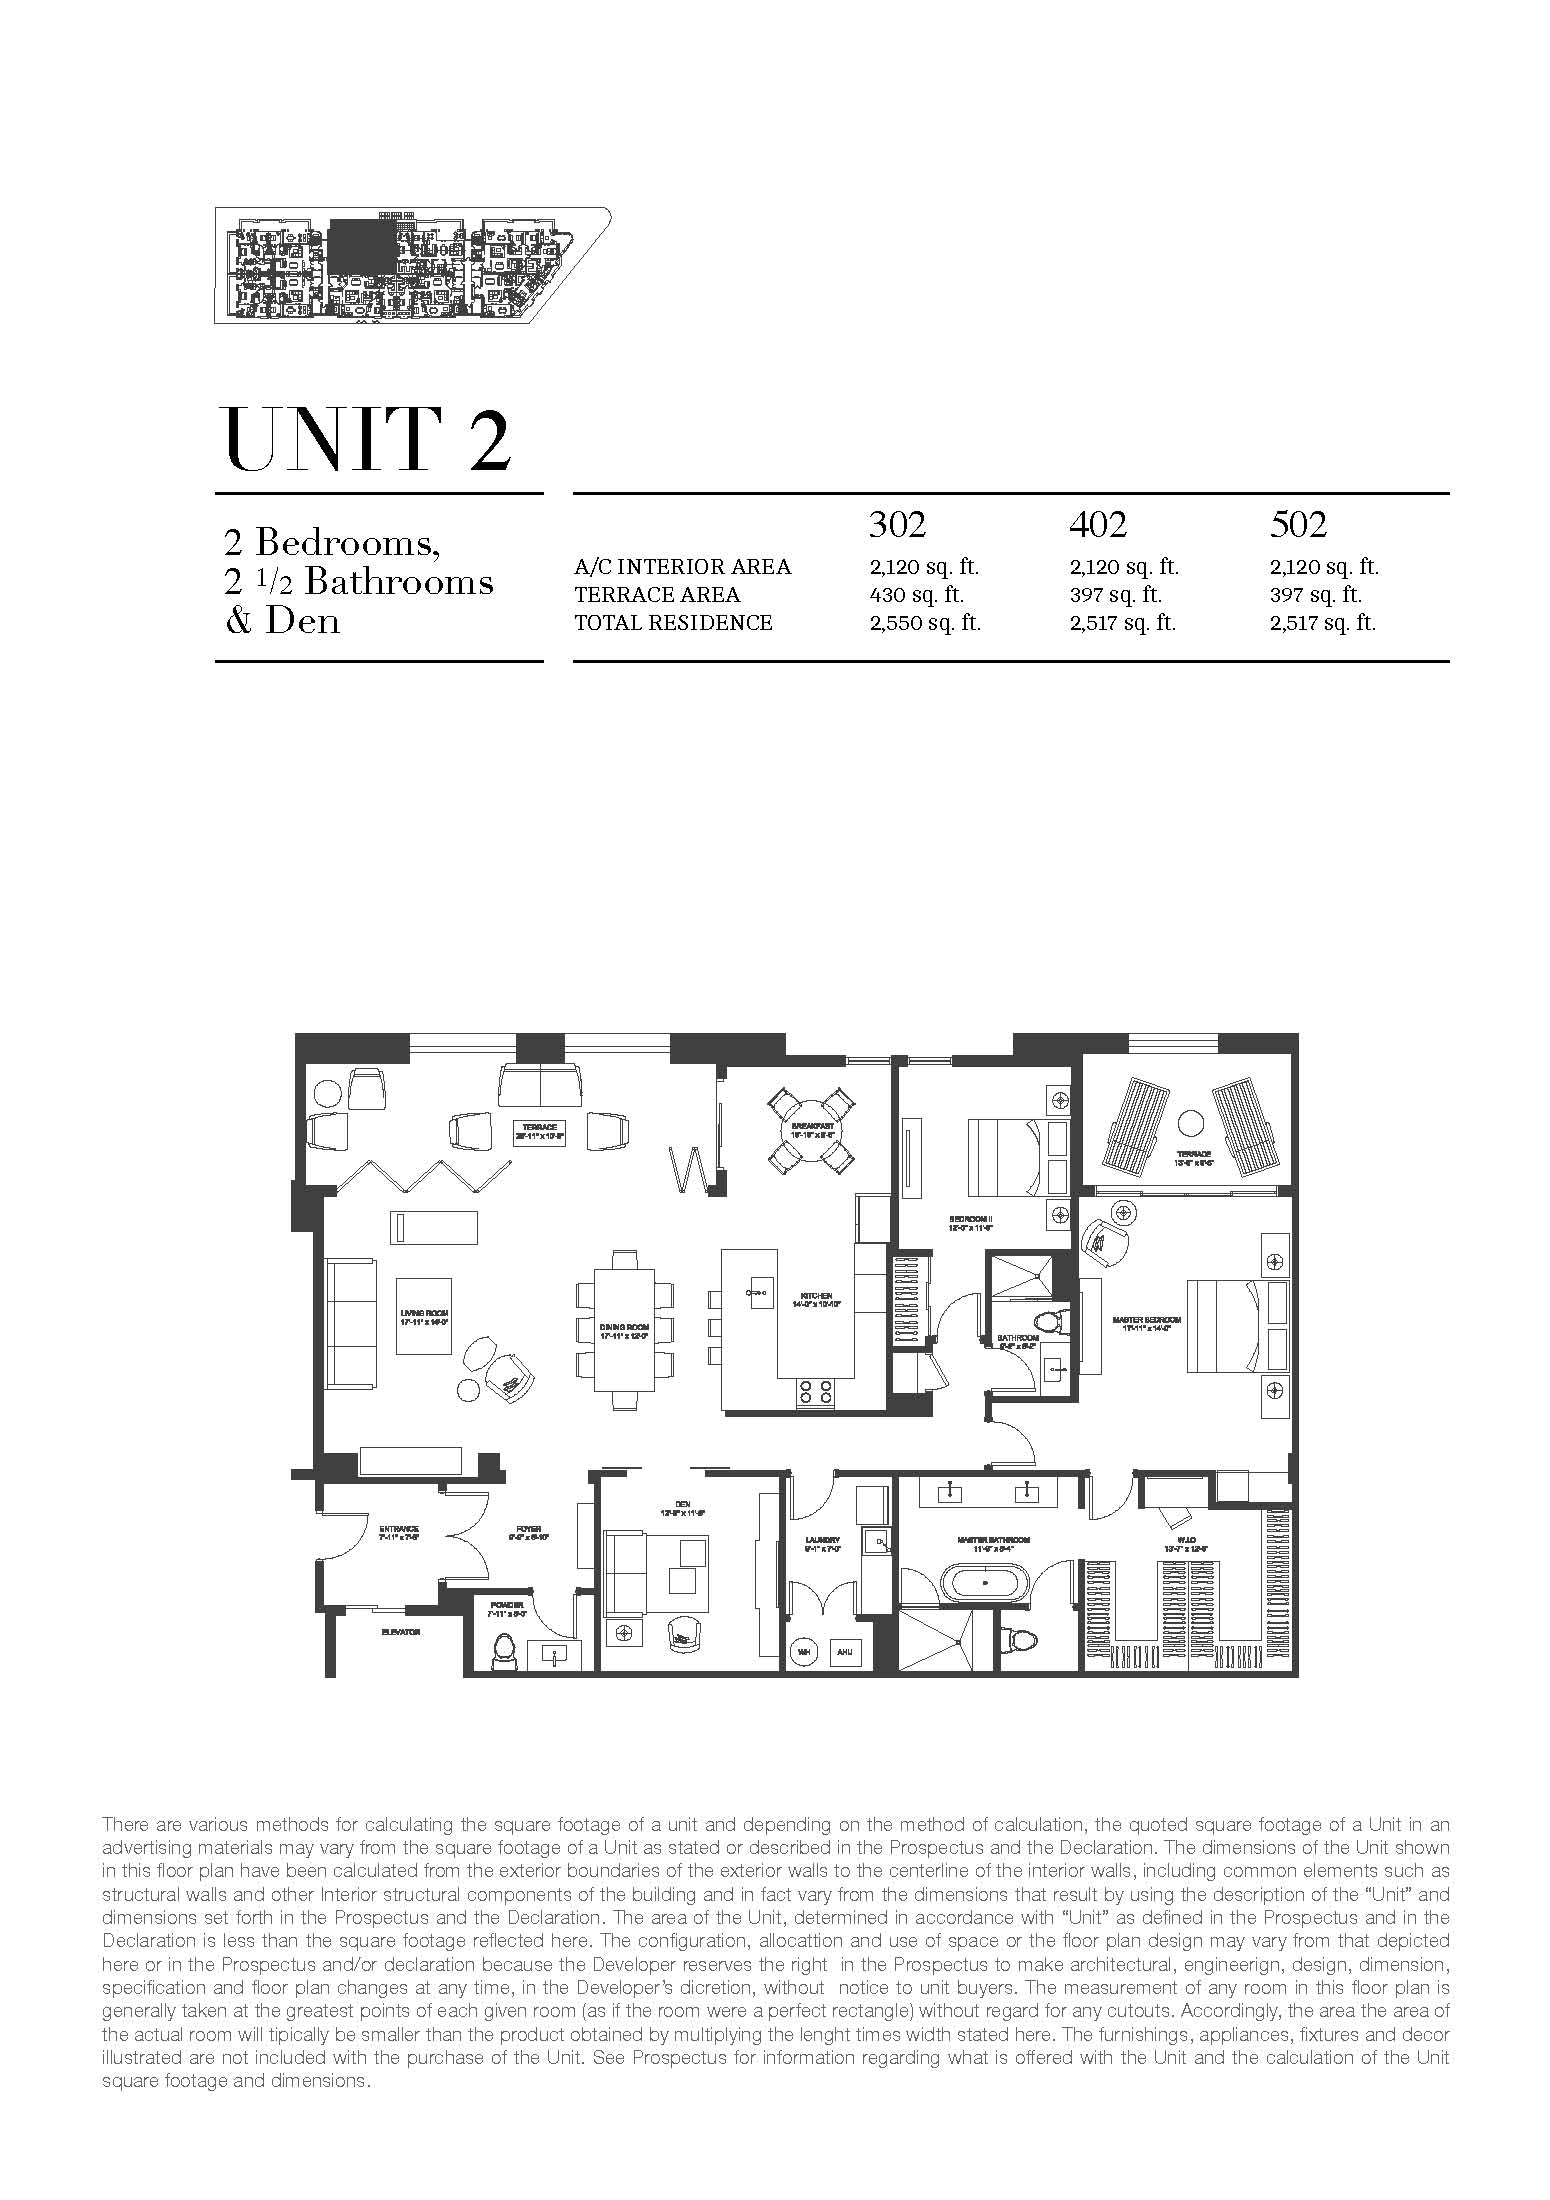 Biltmore Parc - Floorplan 2